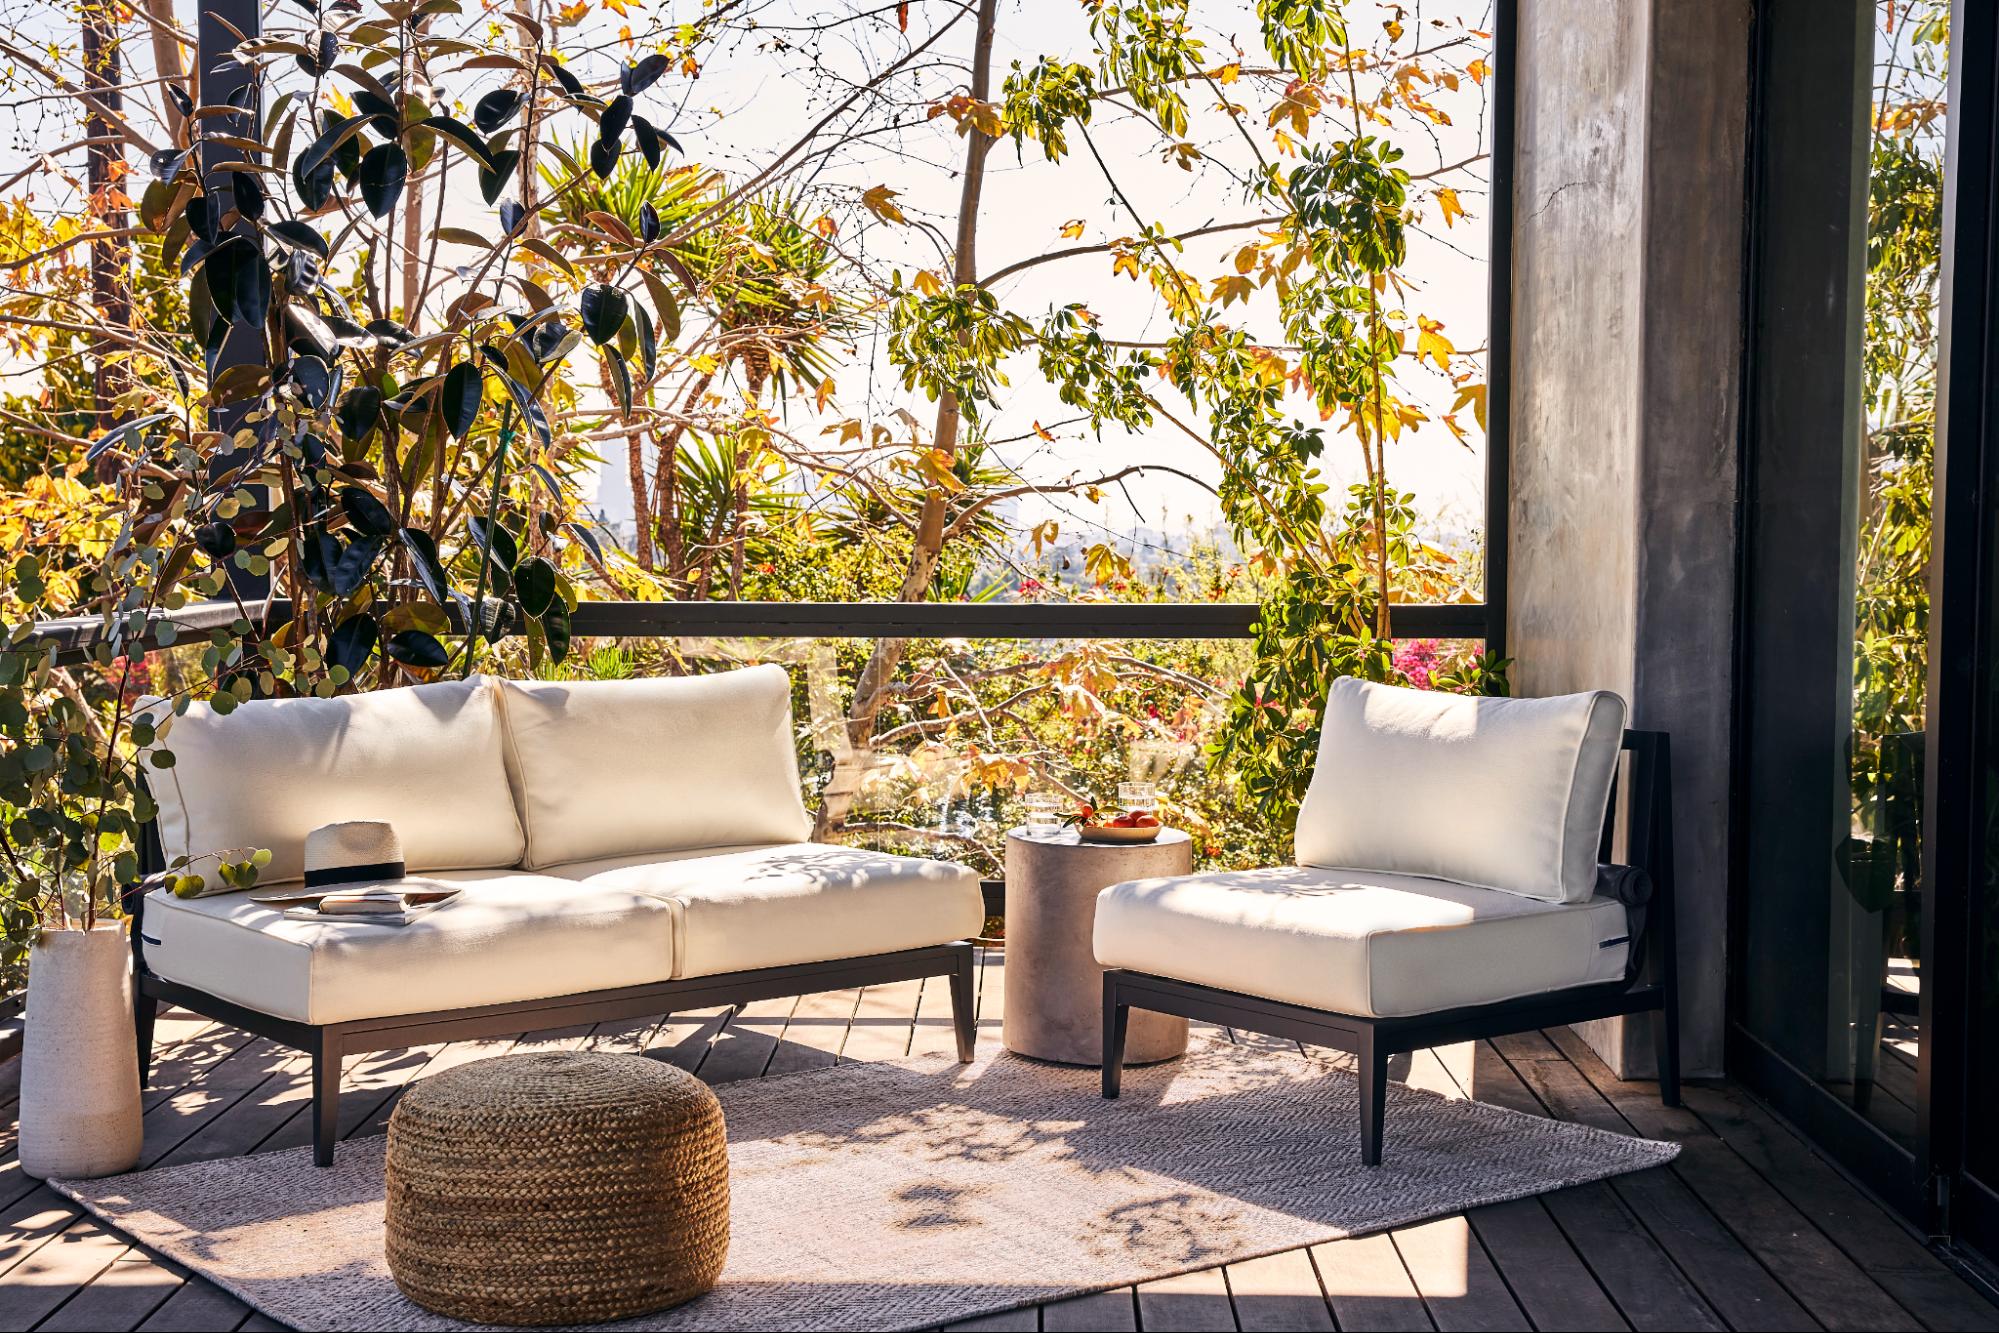 Aluminum outdoor furniture on top of an outdoor rug